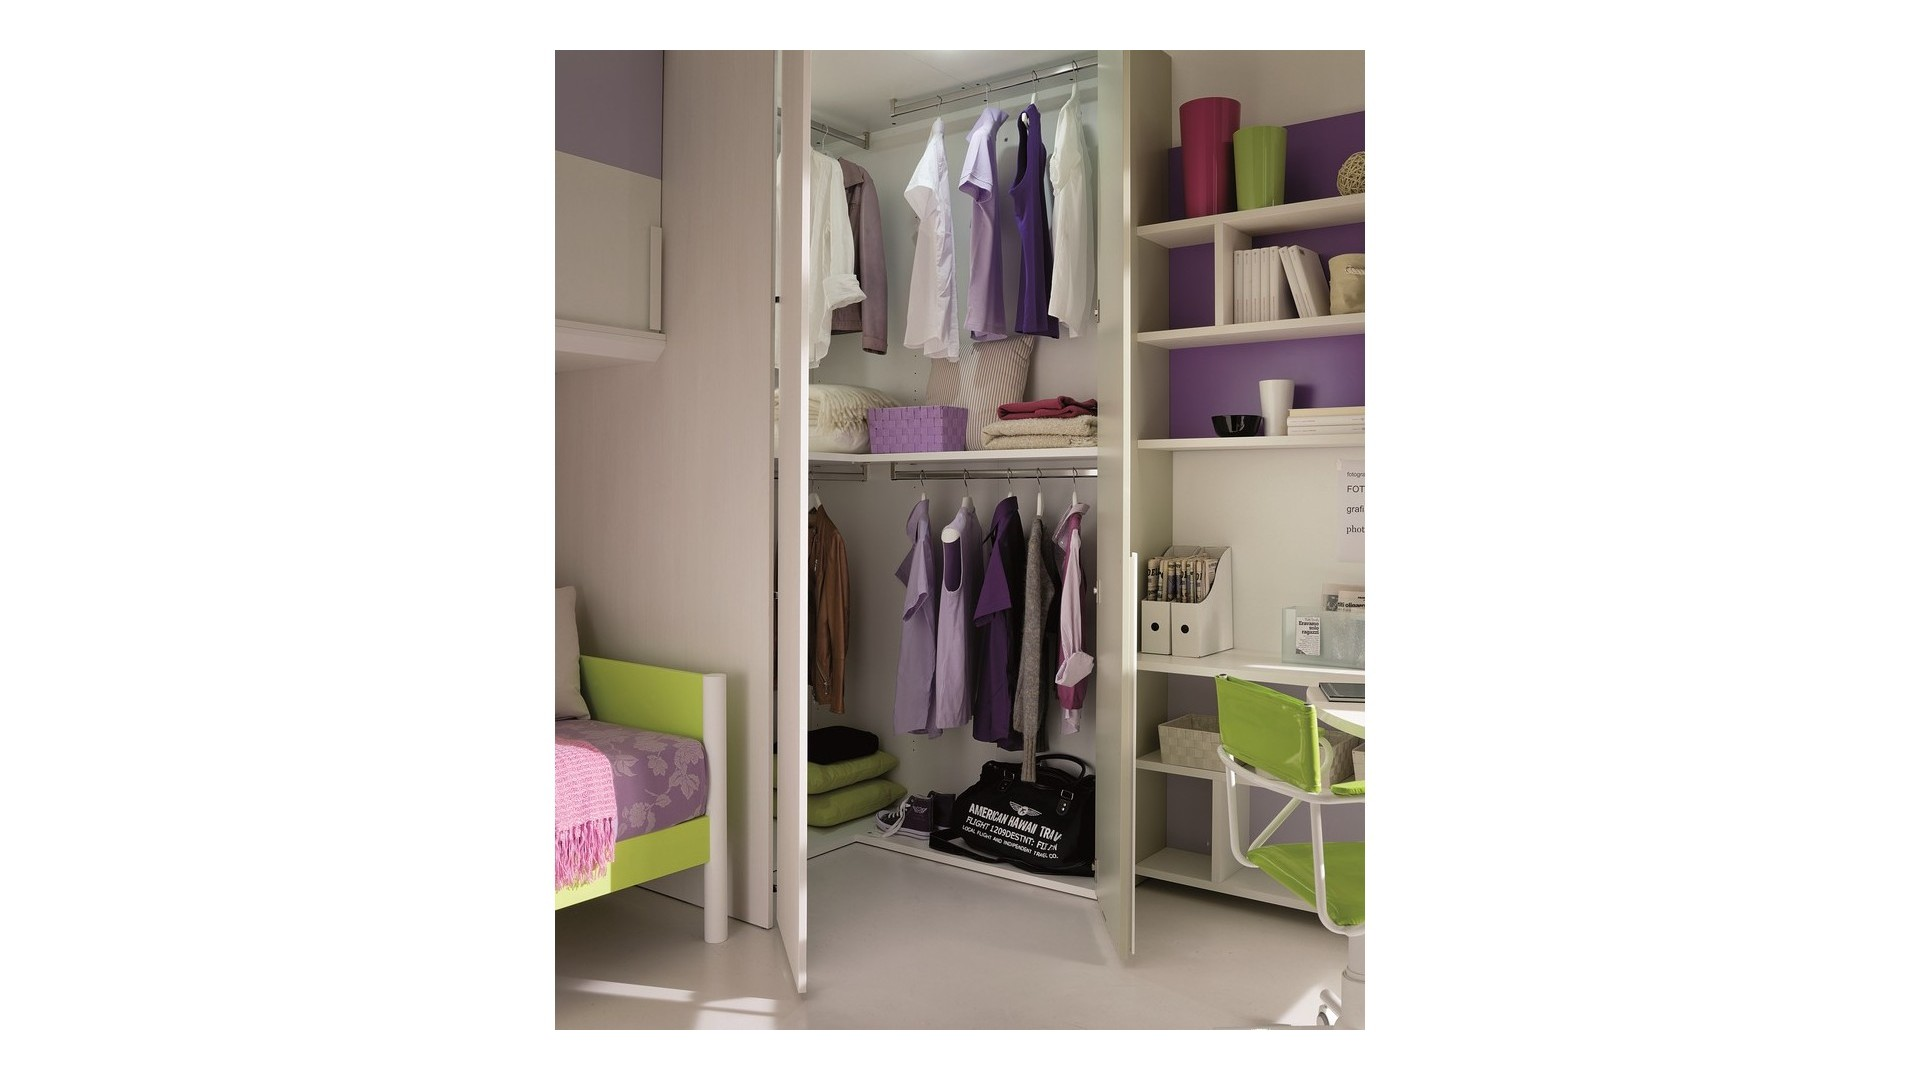 Cabine armadio modulari per camerette - Cabine armadio mercatone uno ...